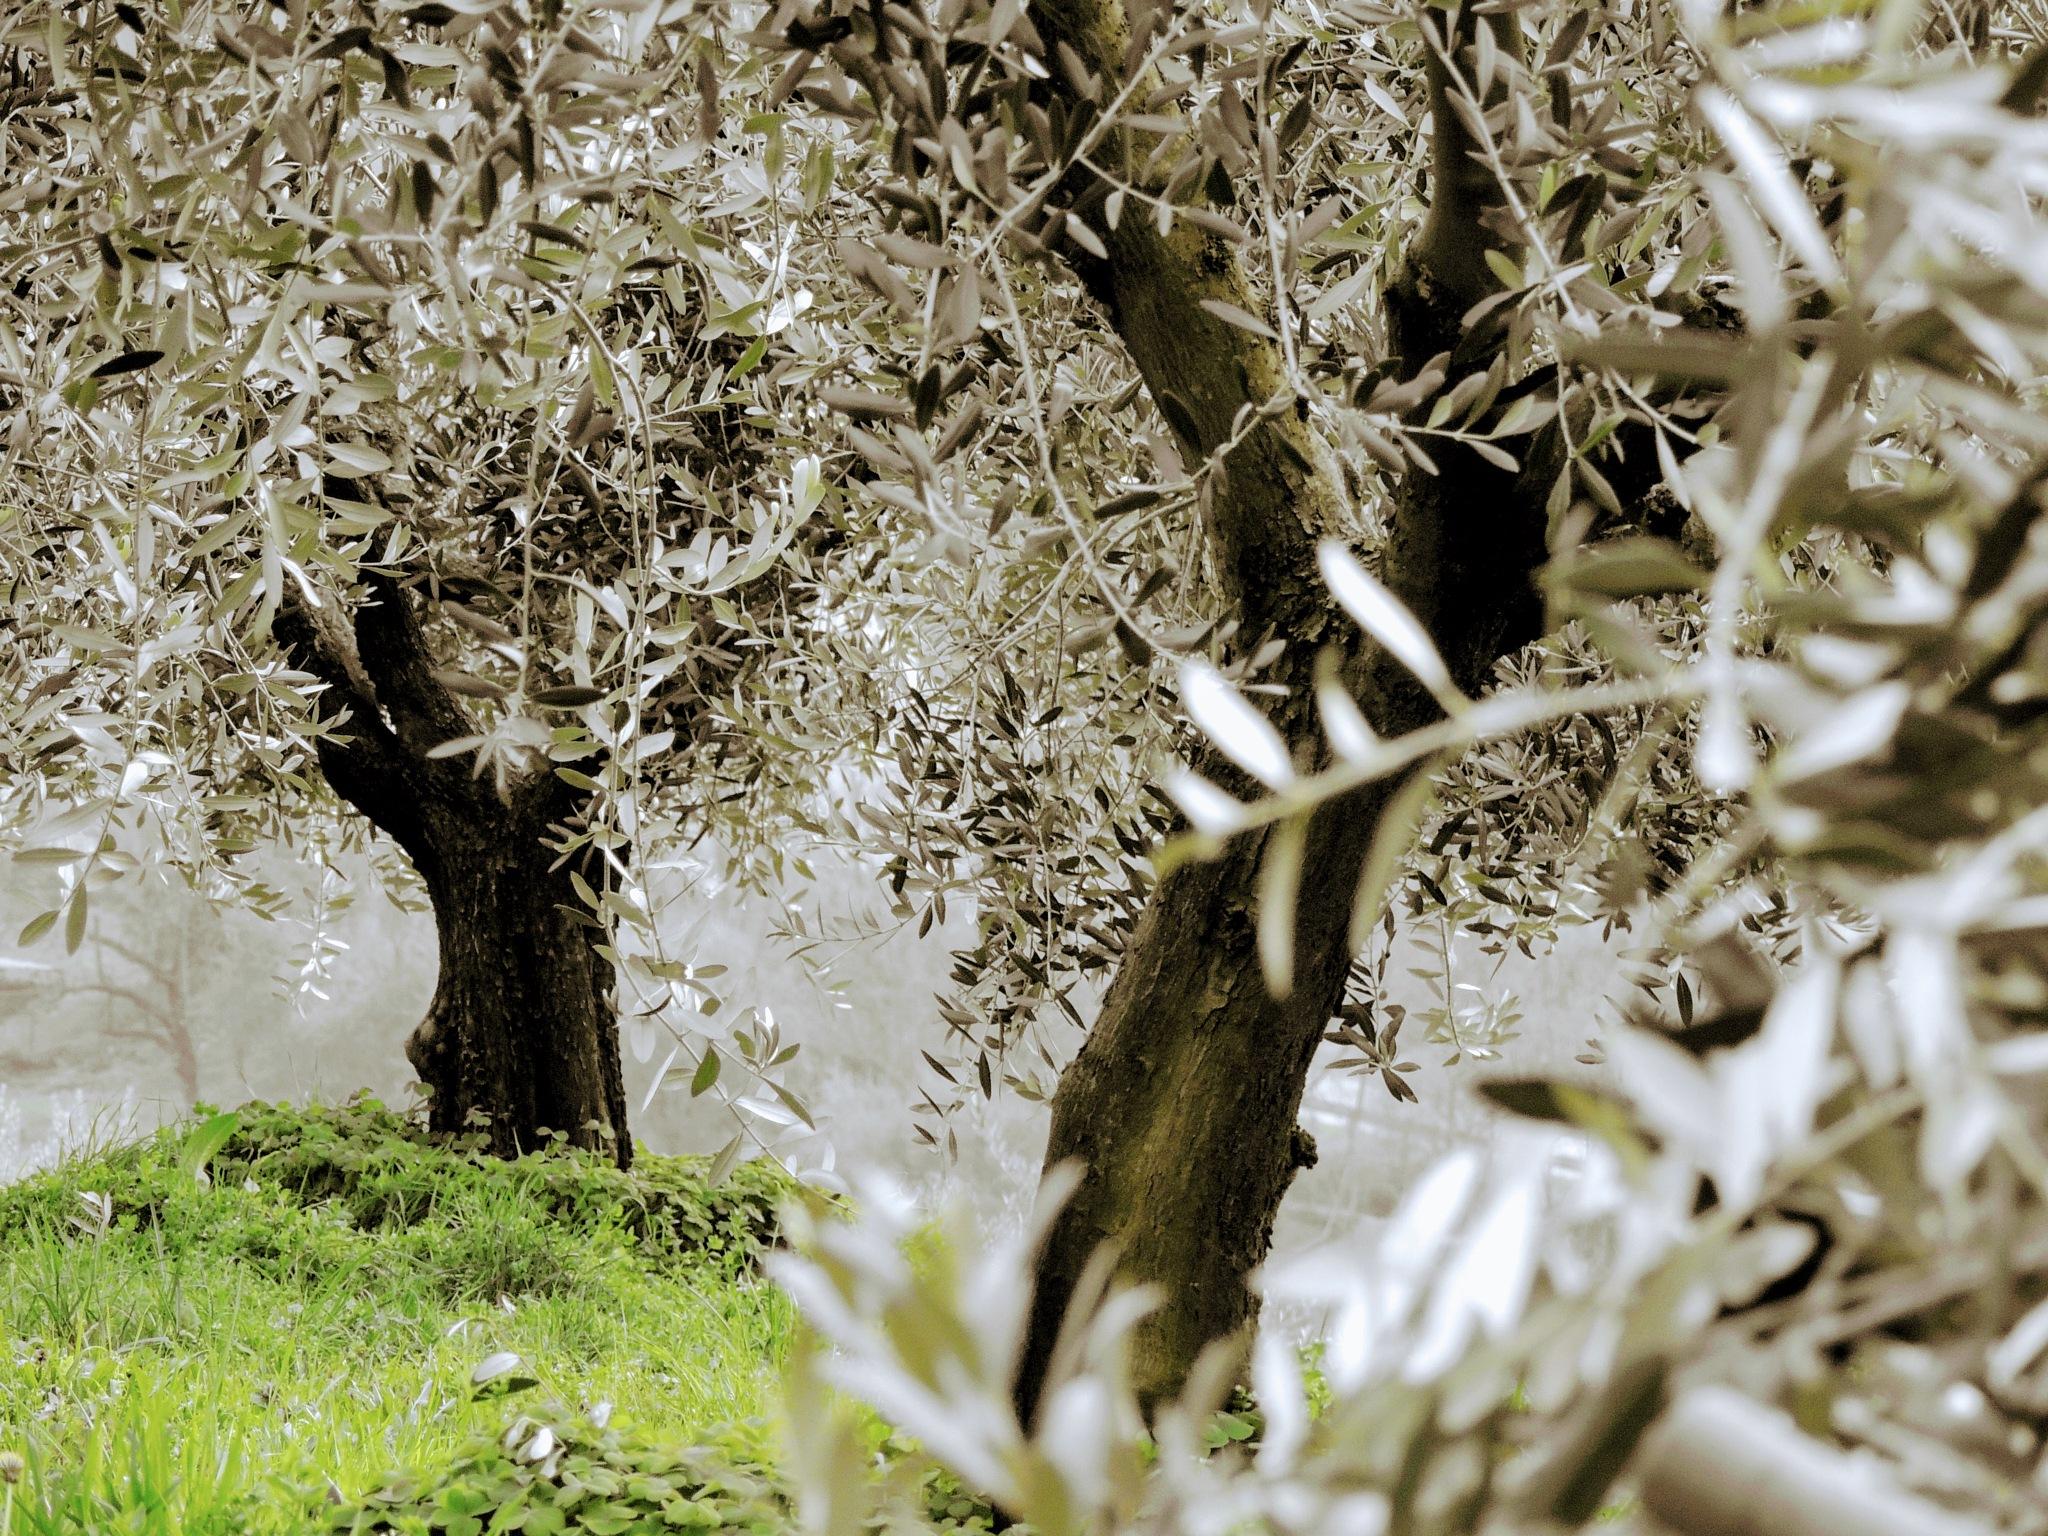 Olives Garden by Damiano Mozzato